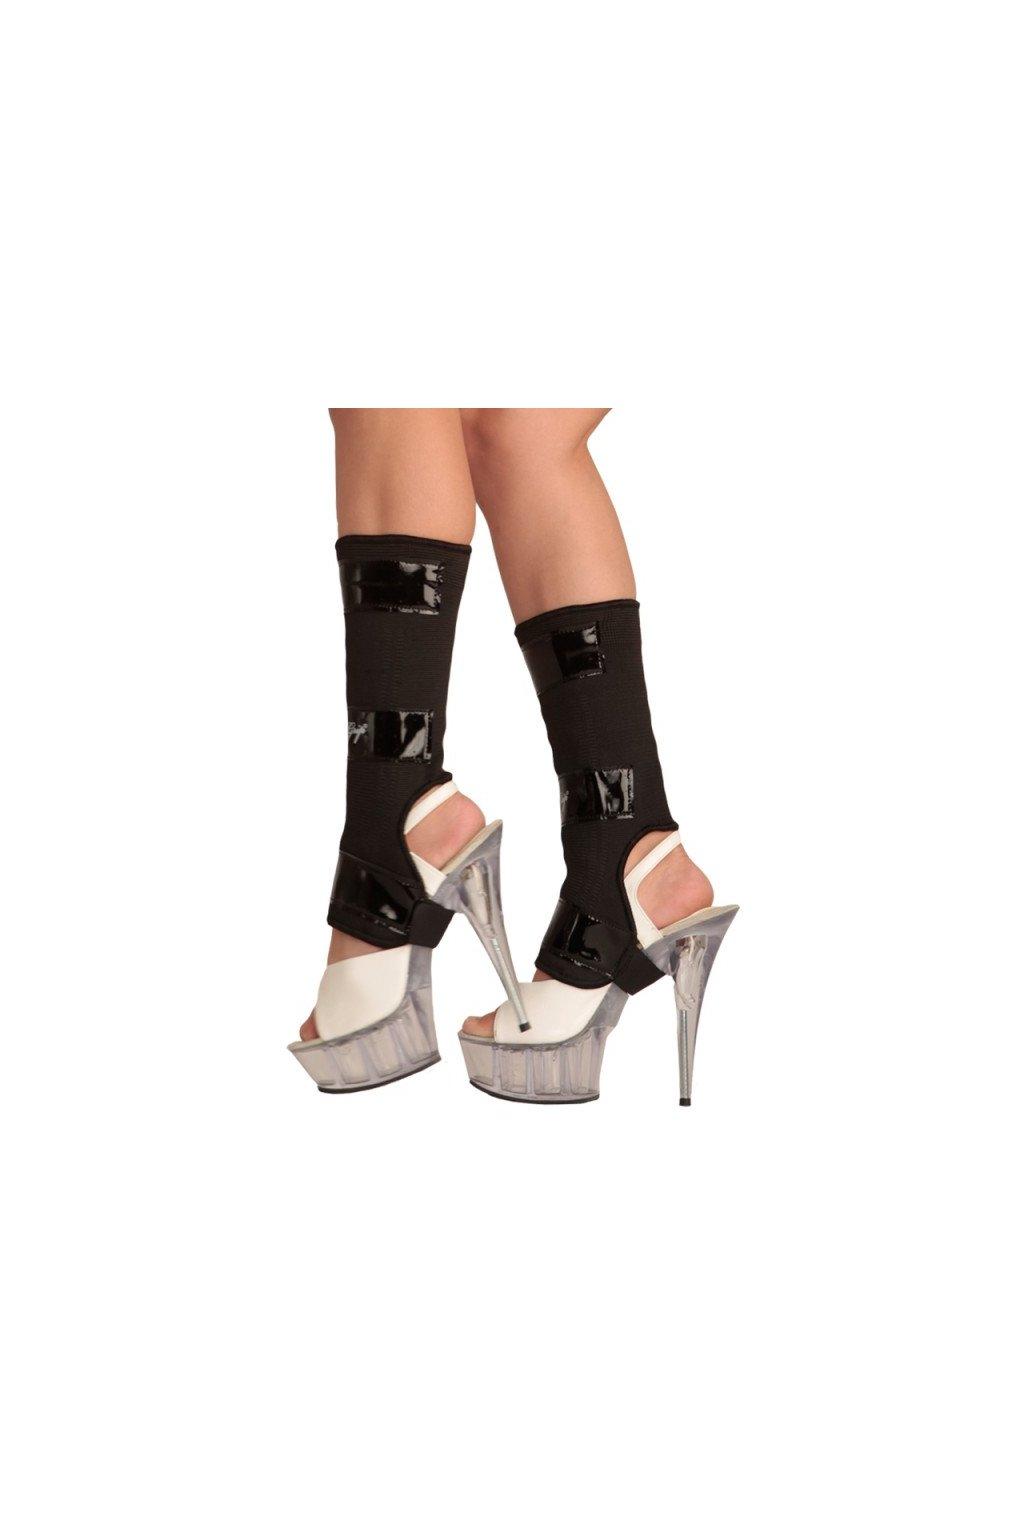 Návleky na boty latex